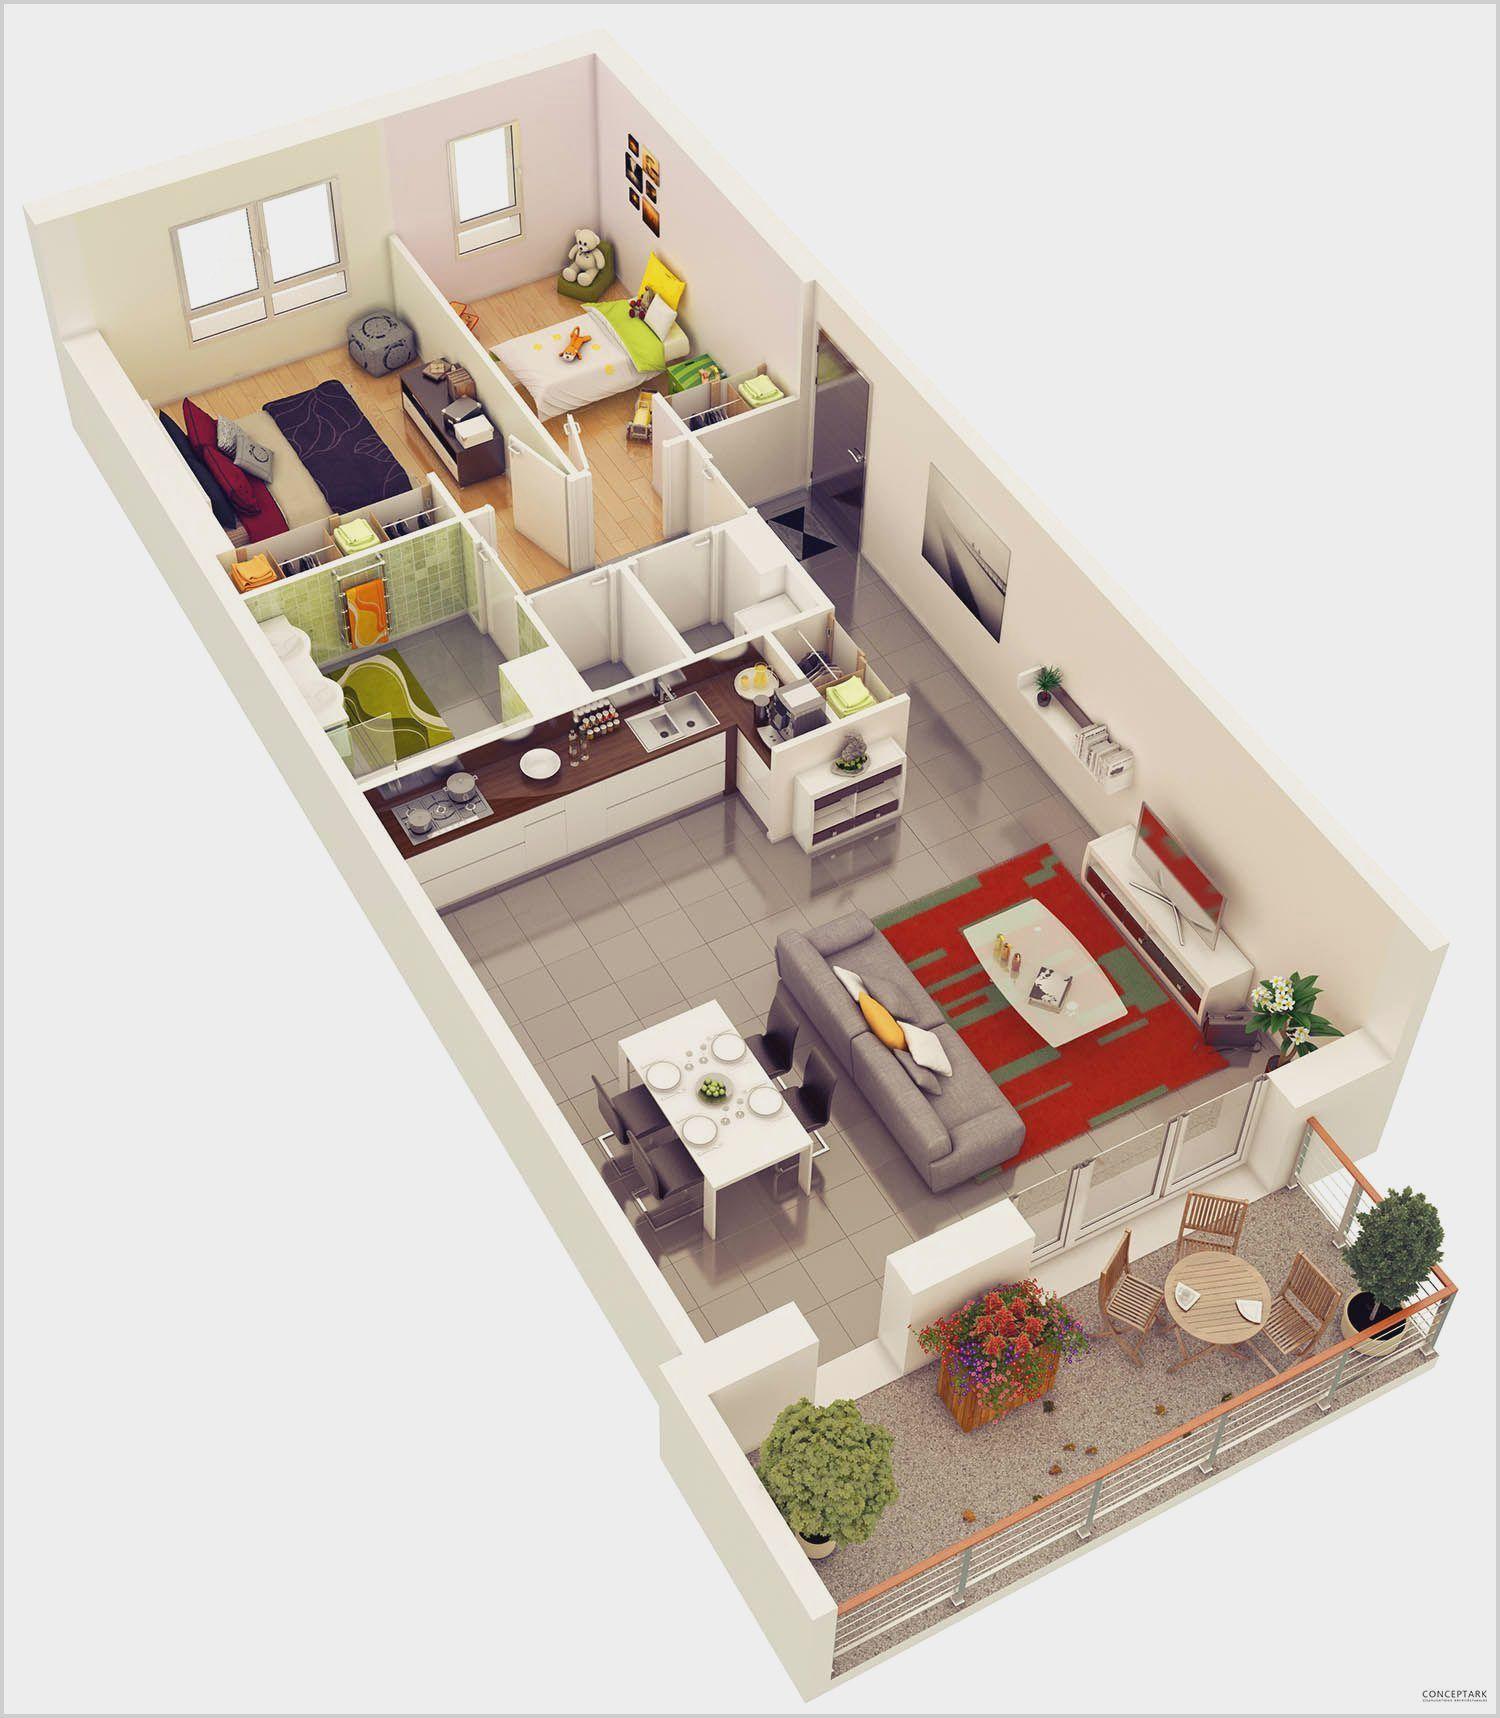 2 Bedroom One Bath Apt Design Small Apartment Plans Small Apartment Floor Plans House Layout Plans